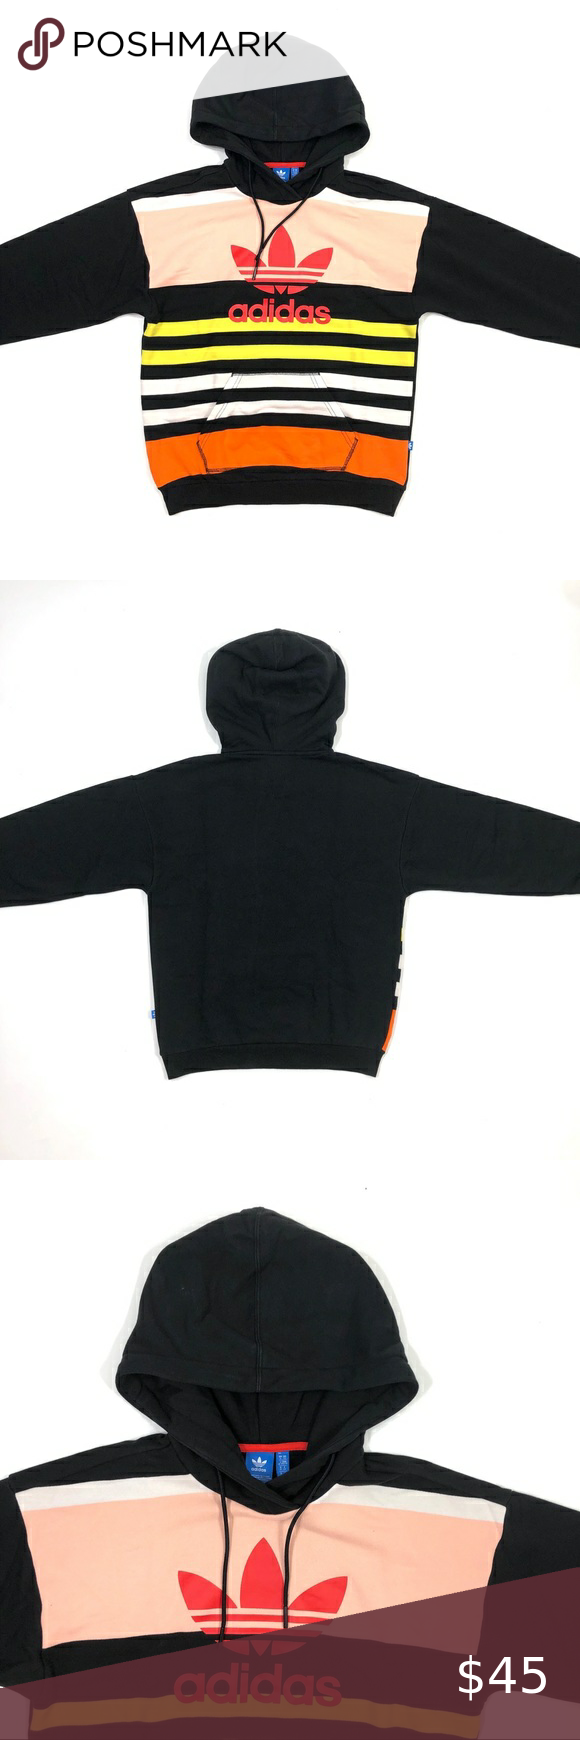 Adidas Originals Trefoil Colorblock Hoodie Adidas Originals Hoodies Sweatshirts Hoodie [ 1740 x 580 Pixel ]